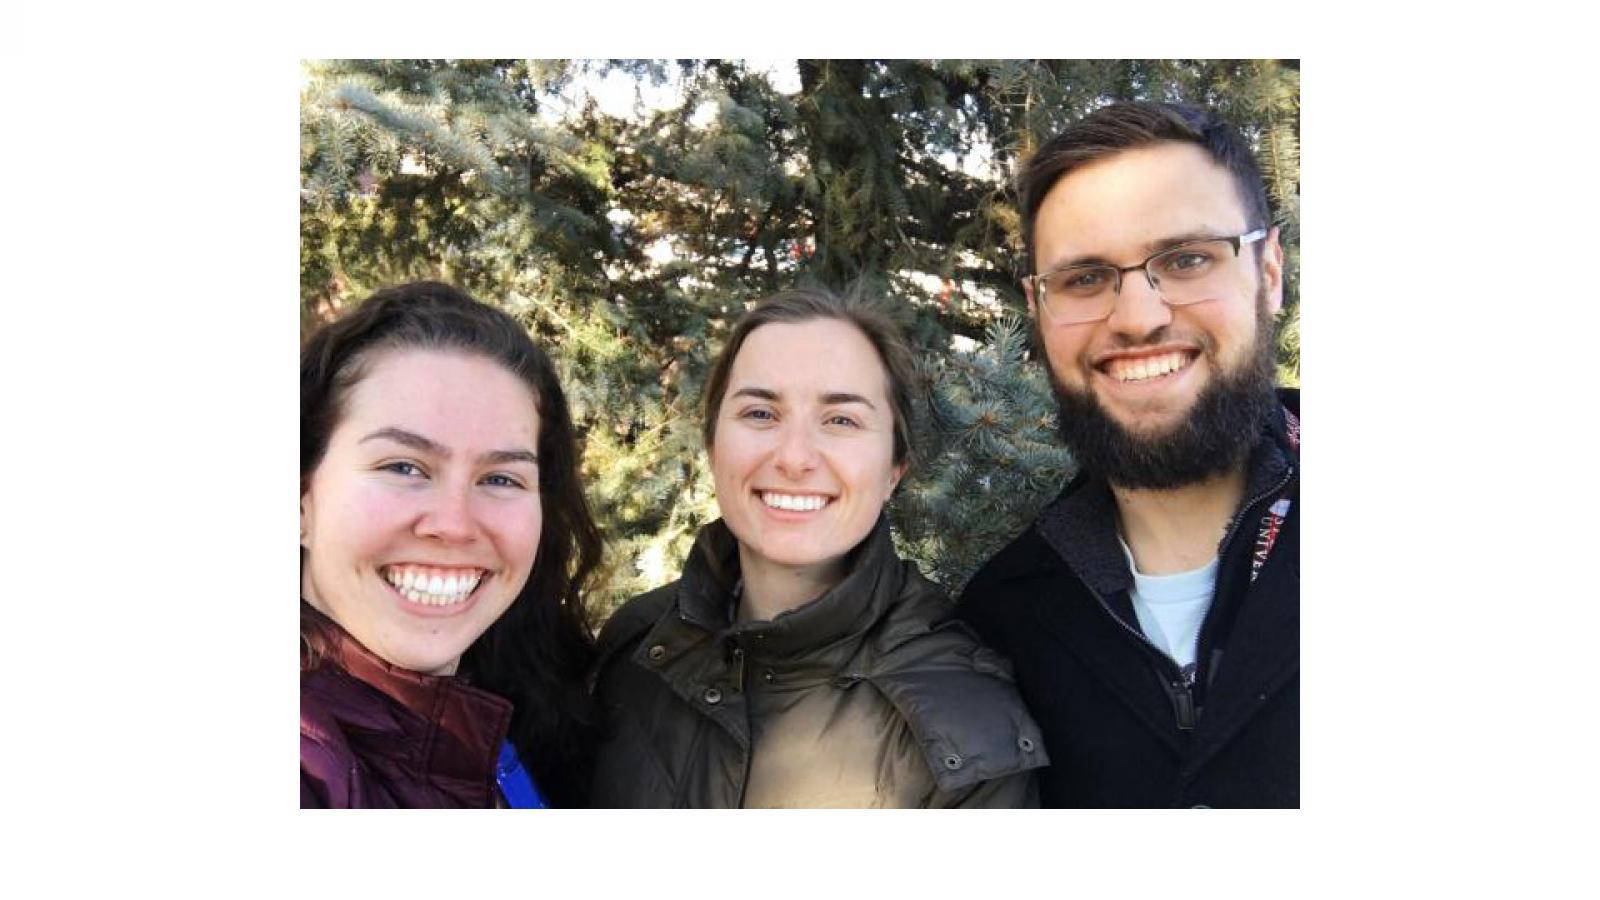 Morgan Cameron, Caroline Hildebrand, and David Smith